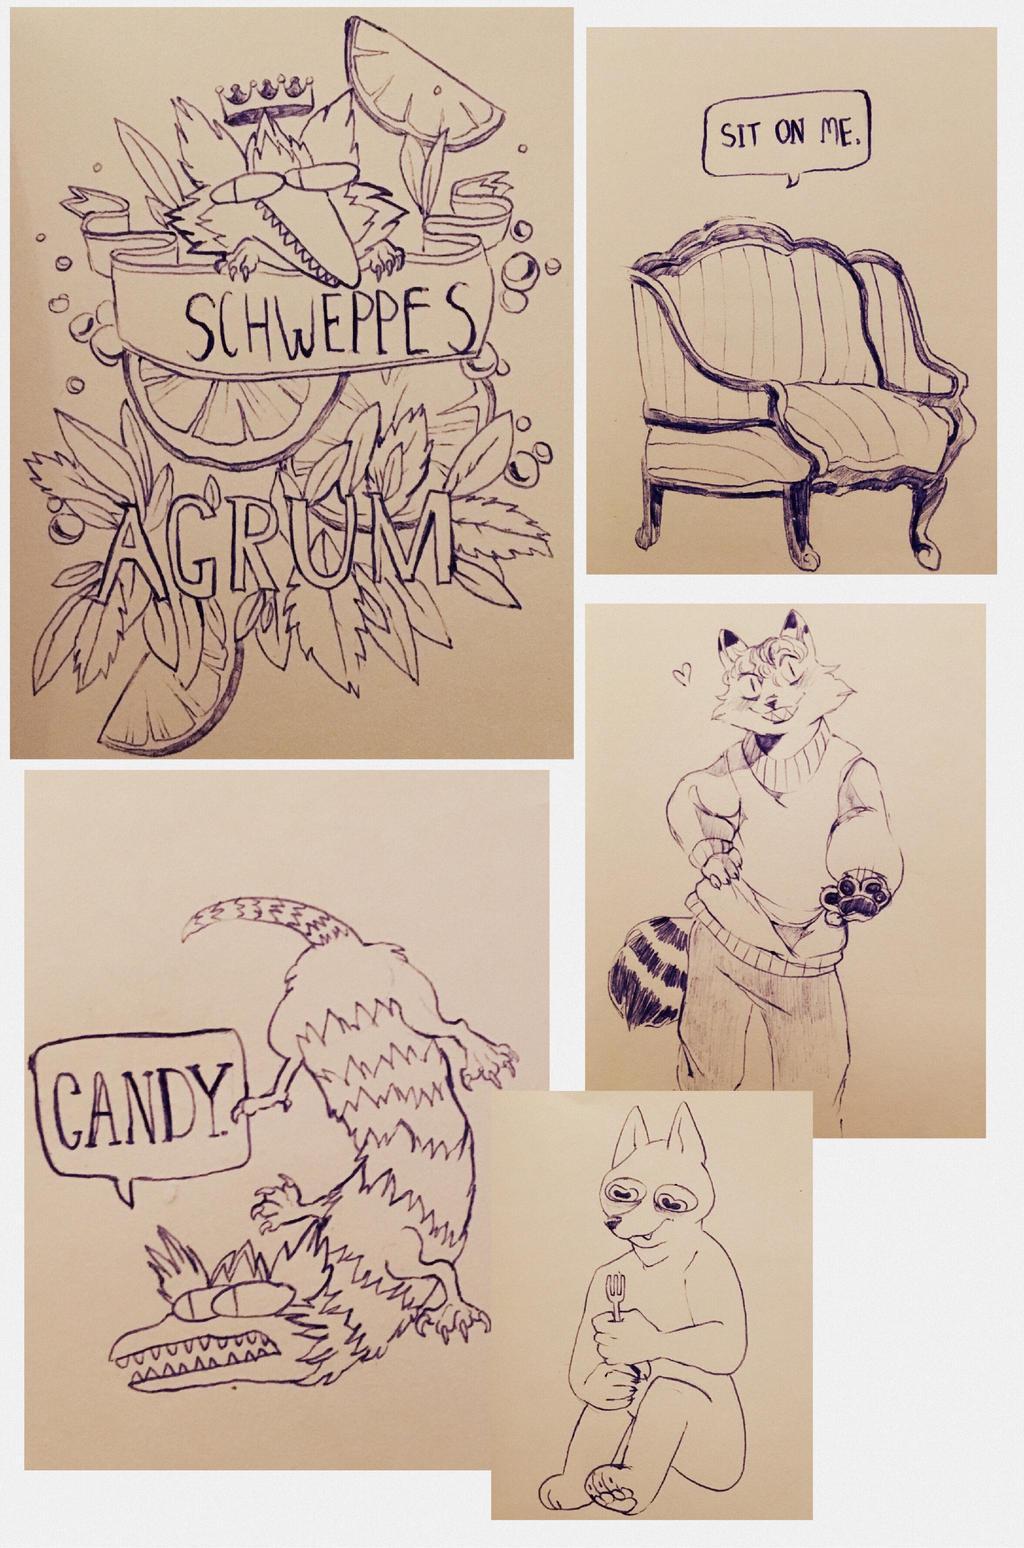 sketchdump9 by cayotze